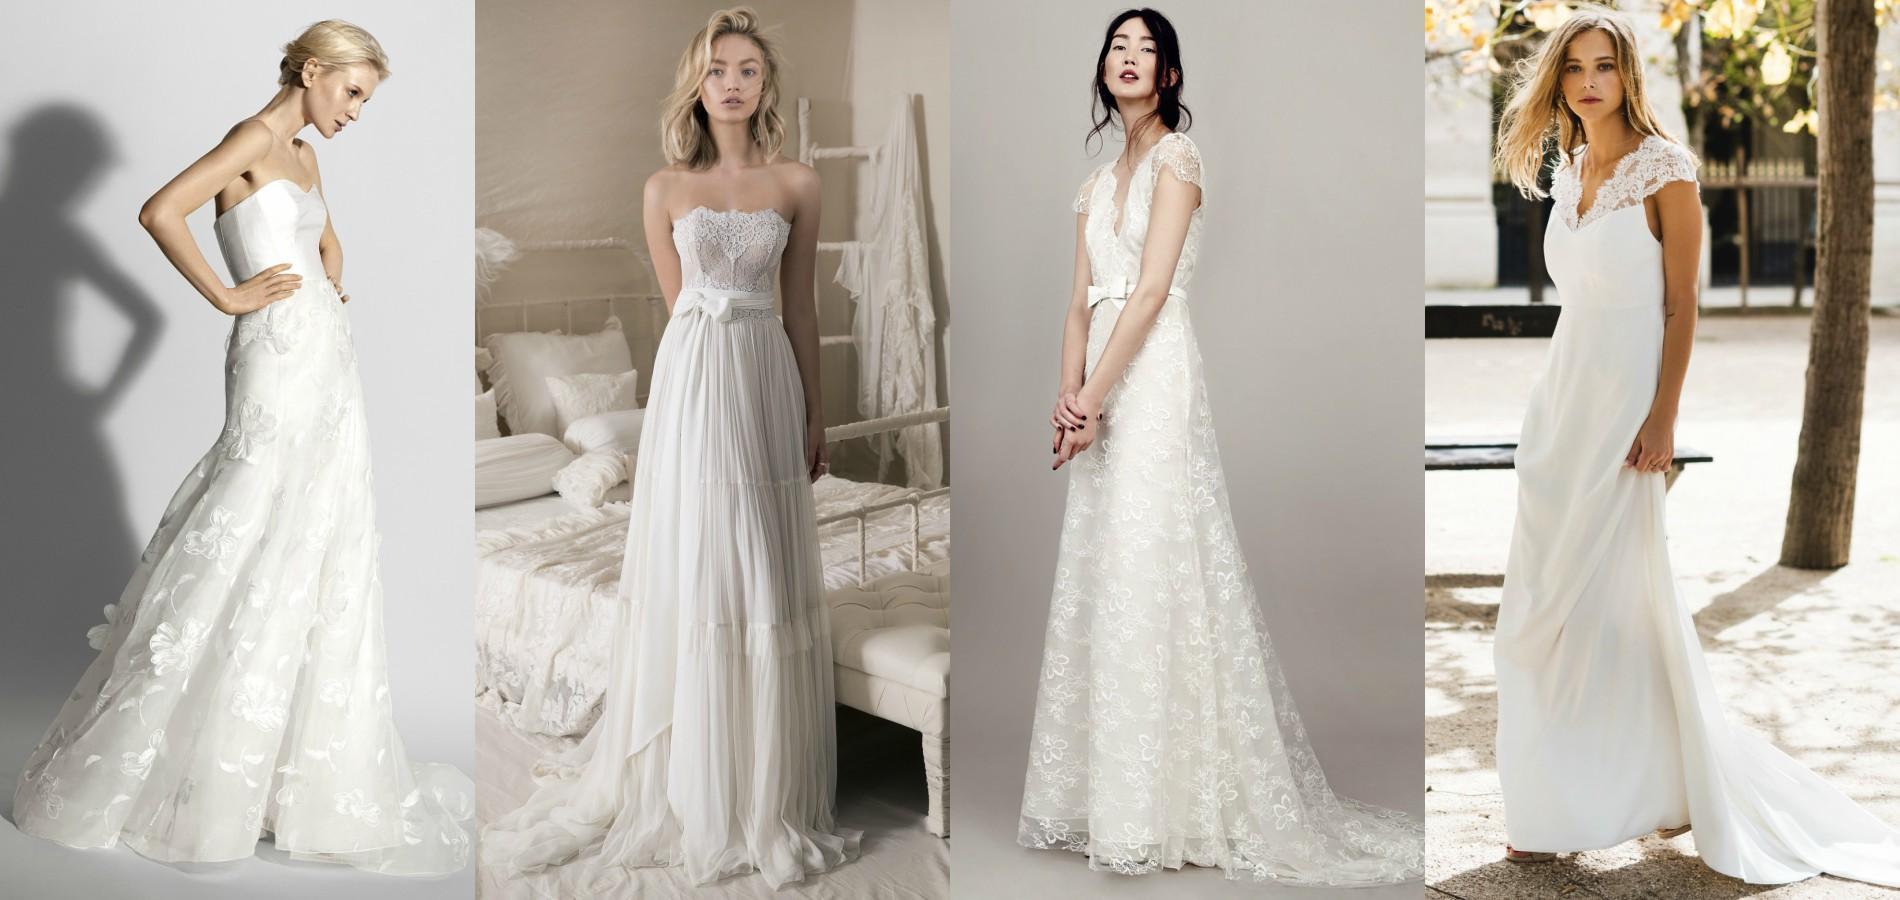 Quelle robe de mariée choisir lorsque l on a une forte poitrine   Photos  presse Carolina Herrera 04f978895c1